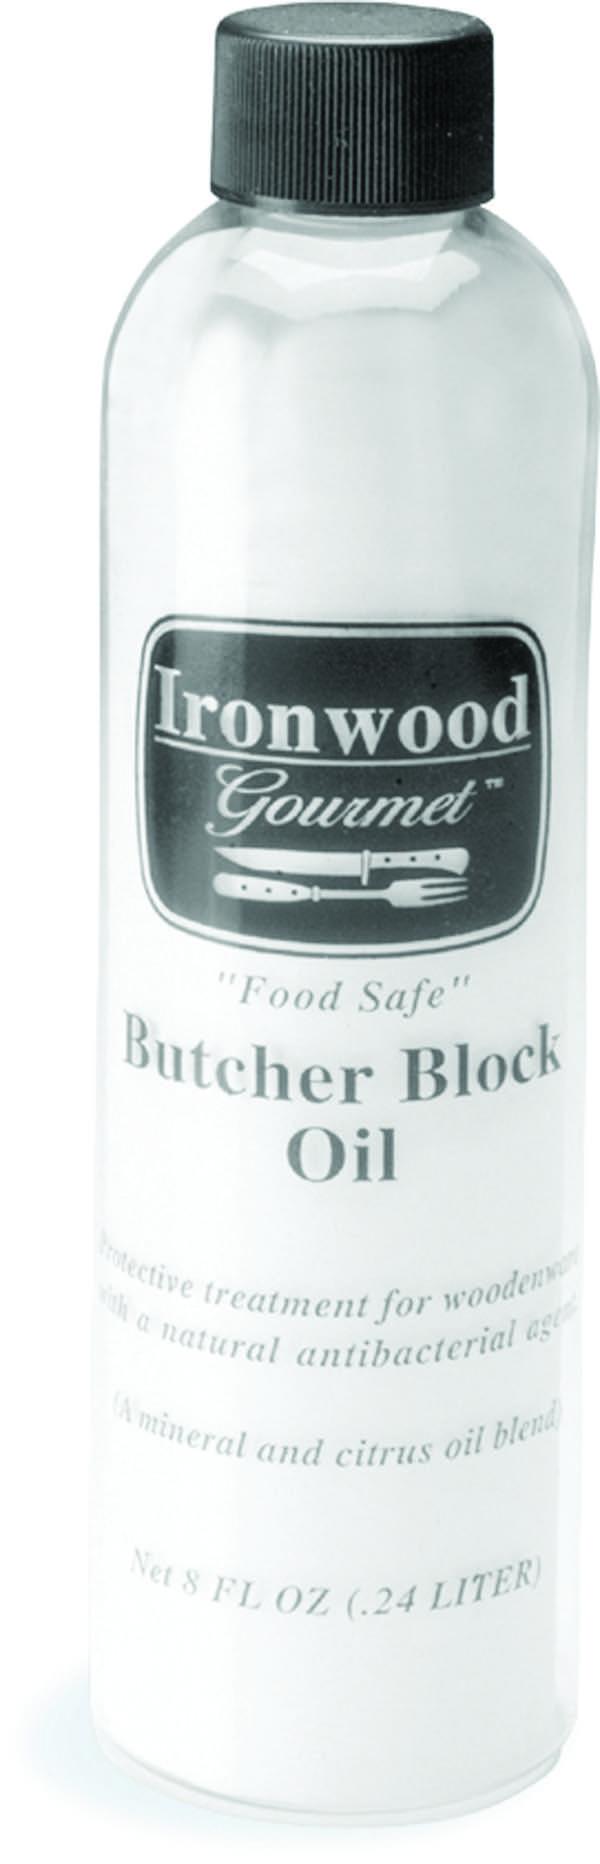 Butcher Block Oil 12-pack